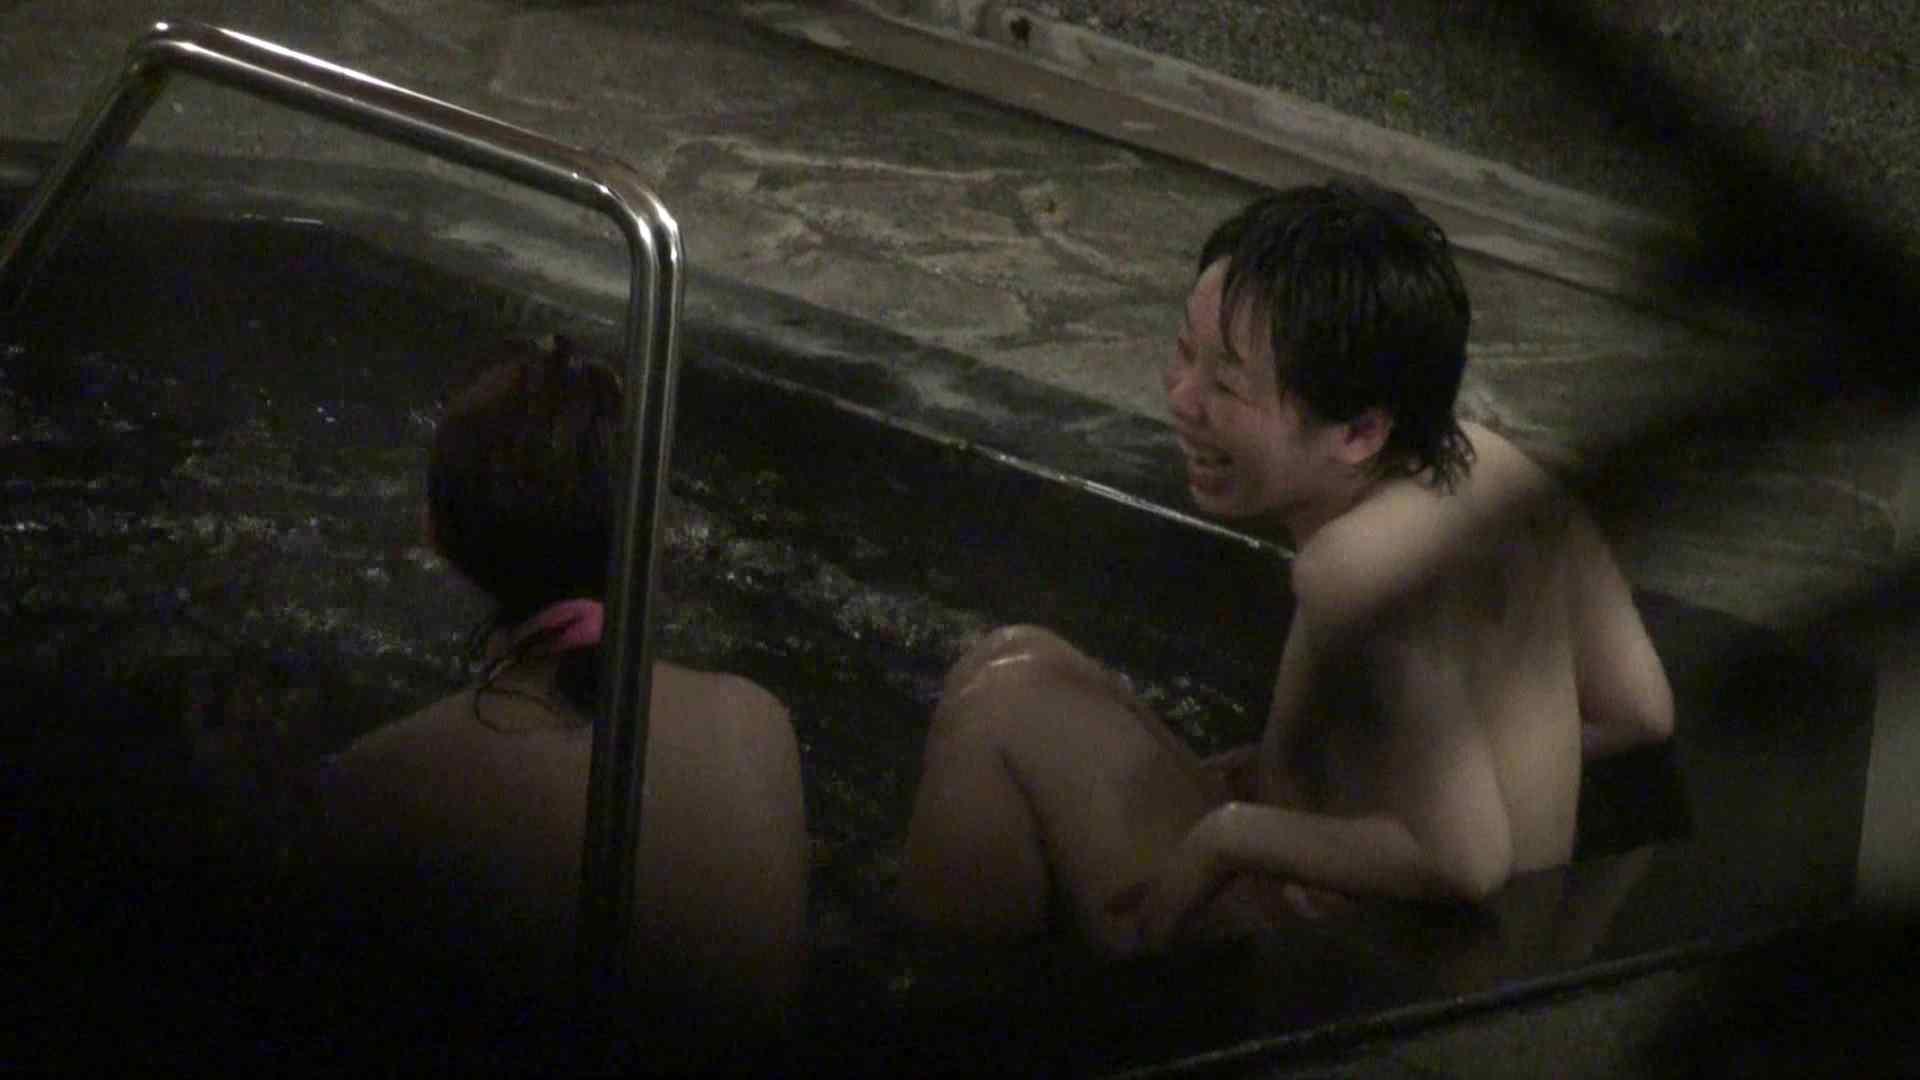 Aquaな露天風呂Vol.394 盗撮 | OLセックス  99画像 88